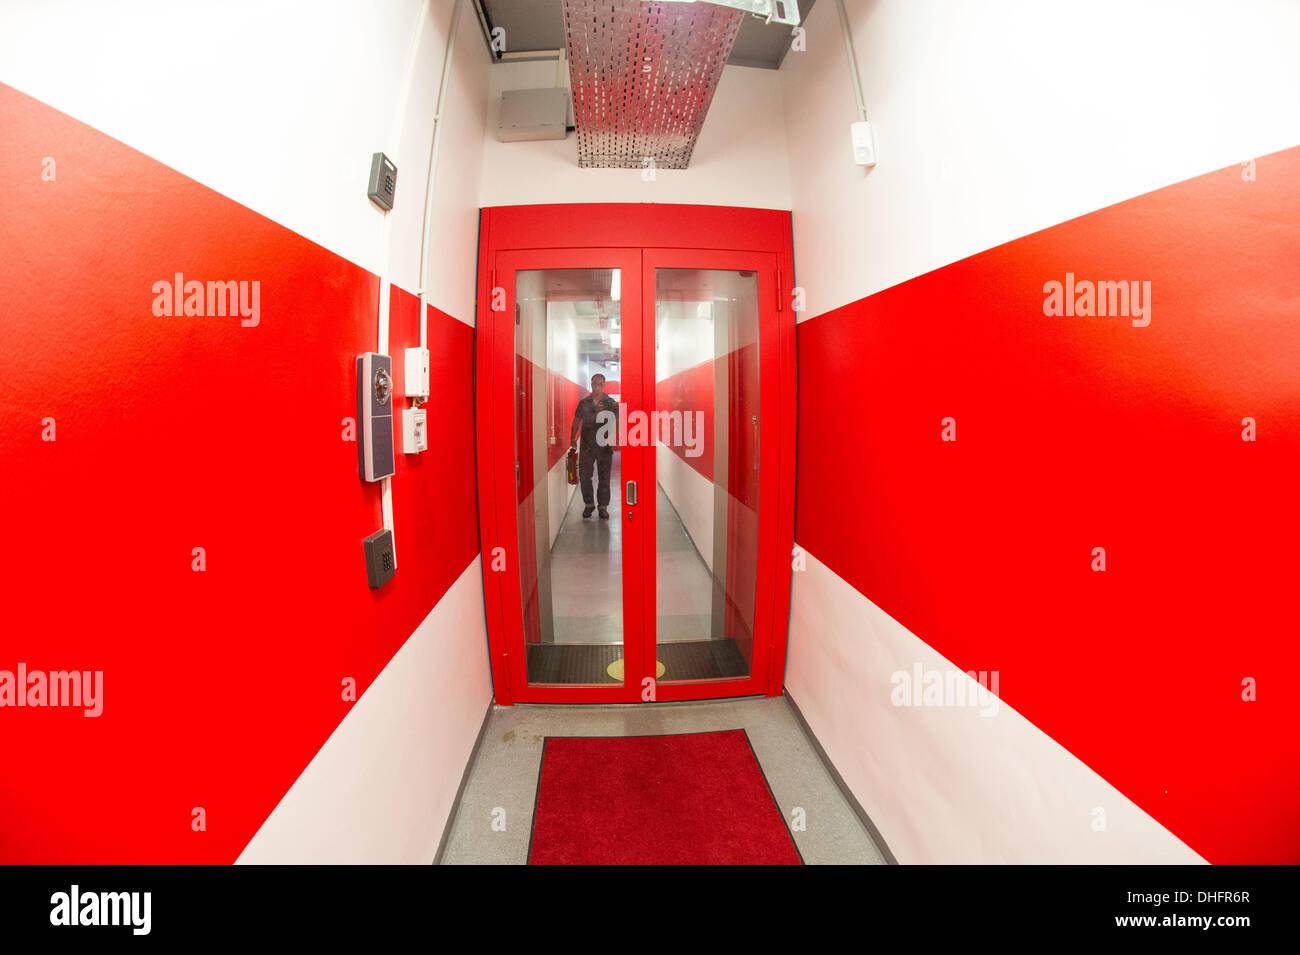 Biometirc Stockfotos & Biometirc Bilder - Alamy